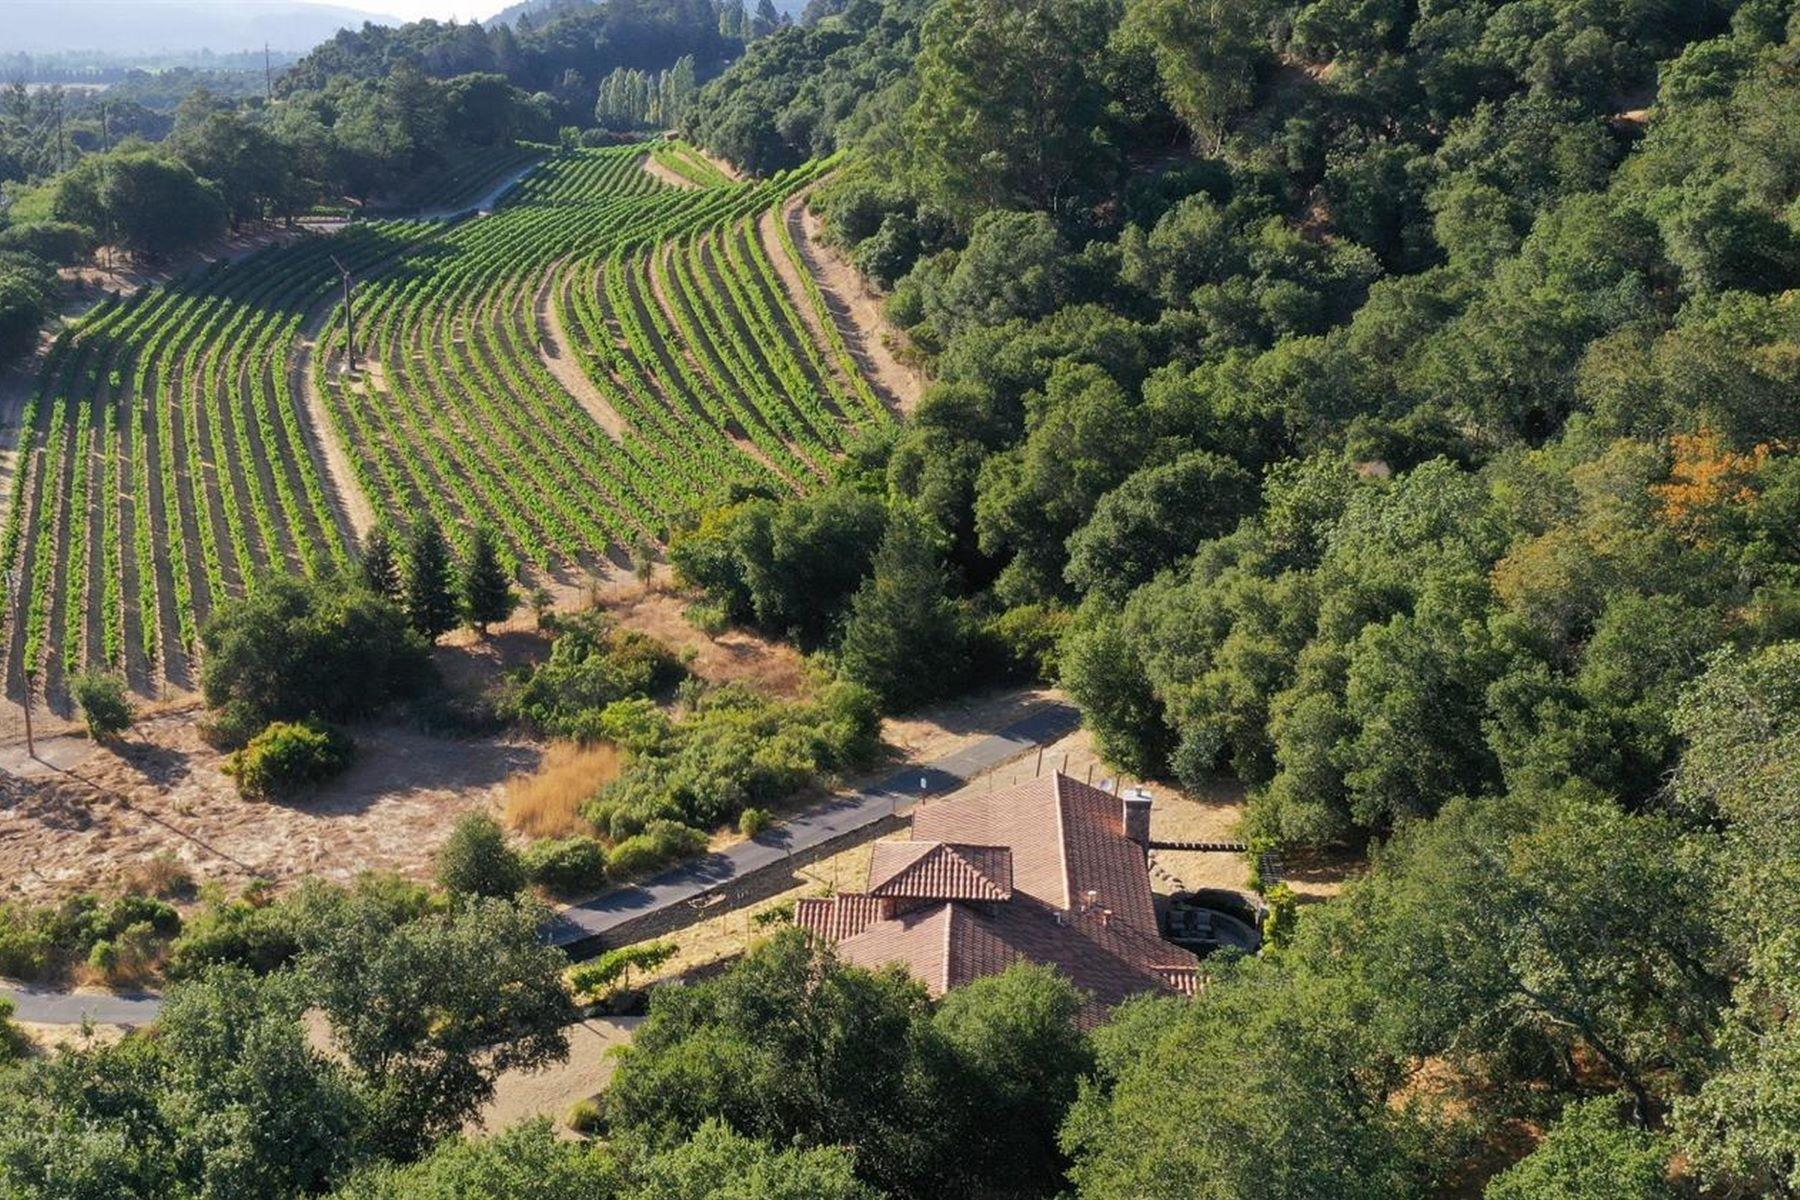 Single Family Homes for Sale at European Inspired Napa Valley Estate 1560 Silverado Trail St. Helena, California 94574 United States